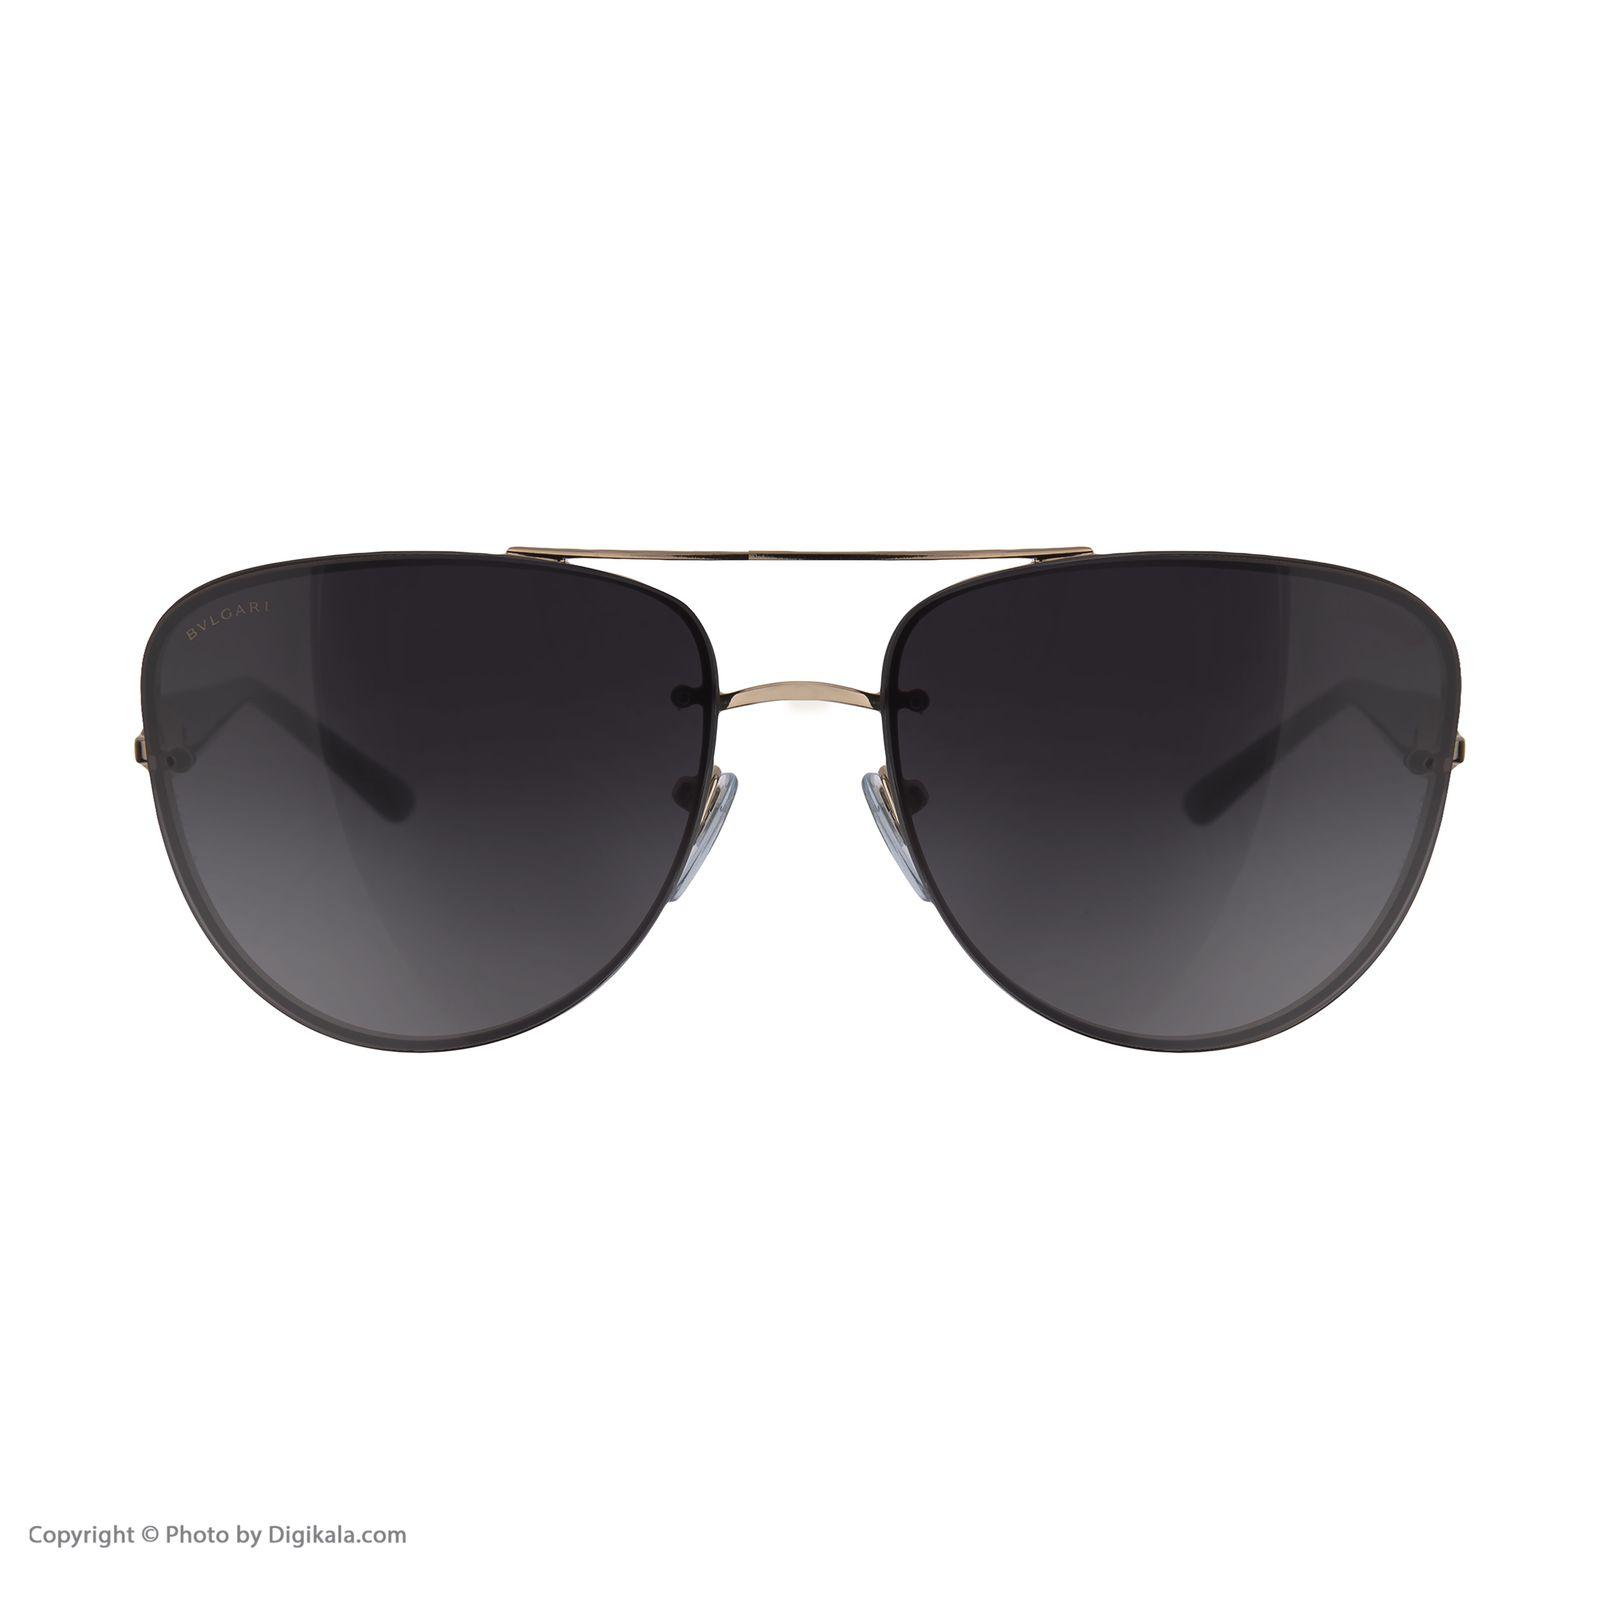 عینک آفتابی مردانه بولگاری مدل BV6086B 20148G -  - 3